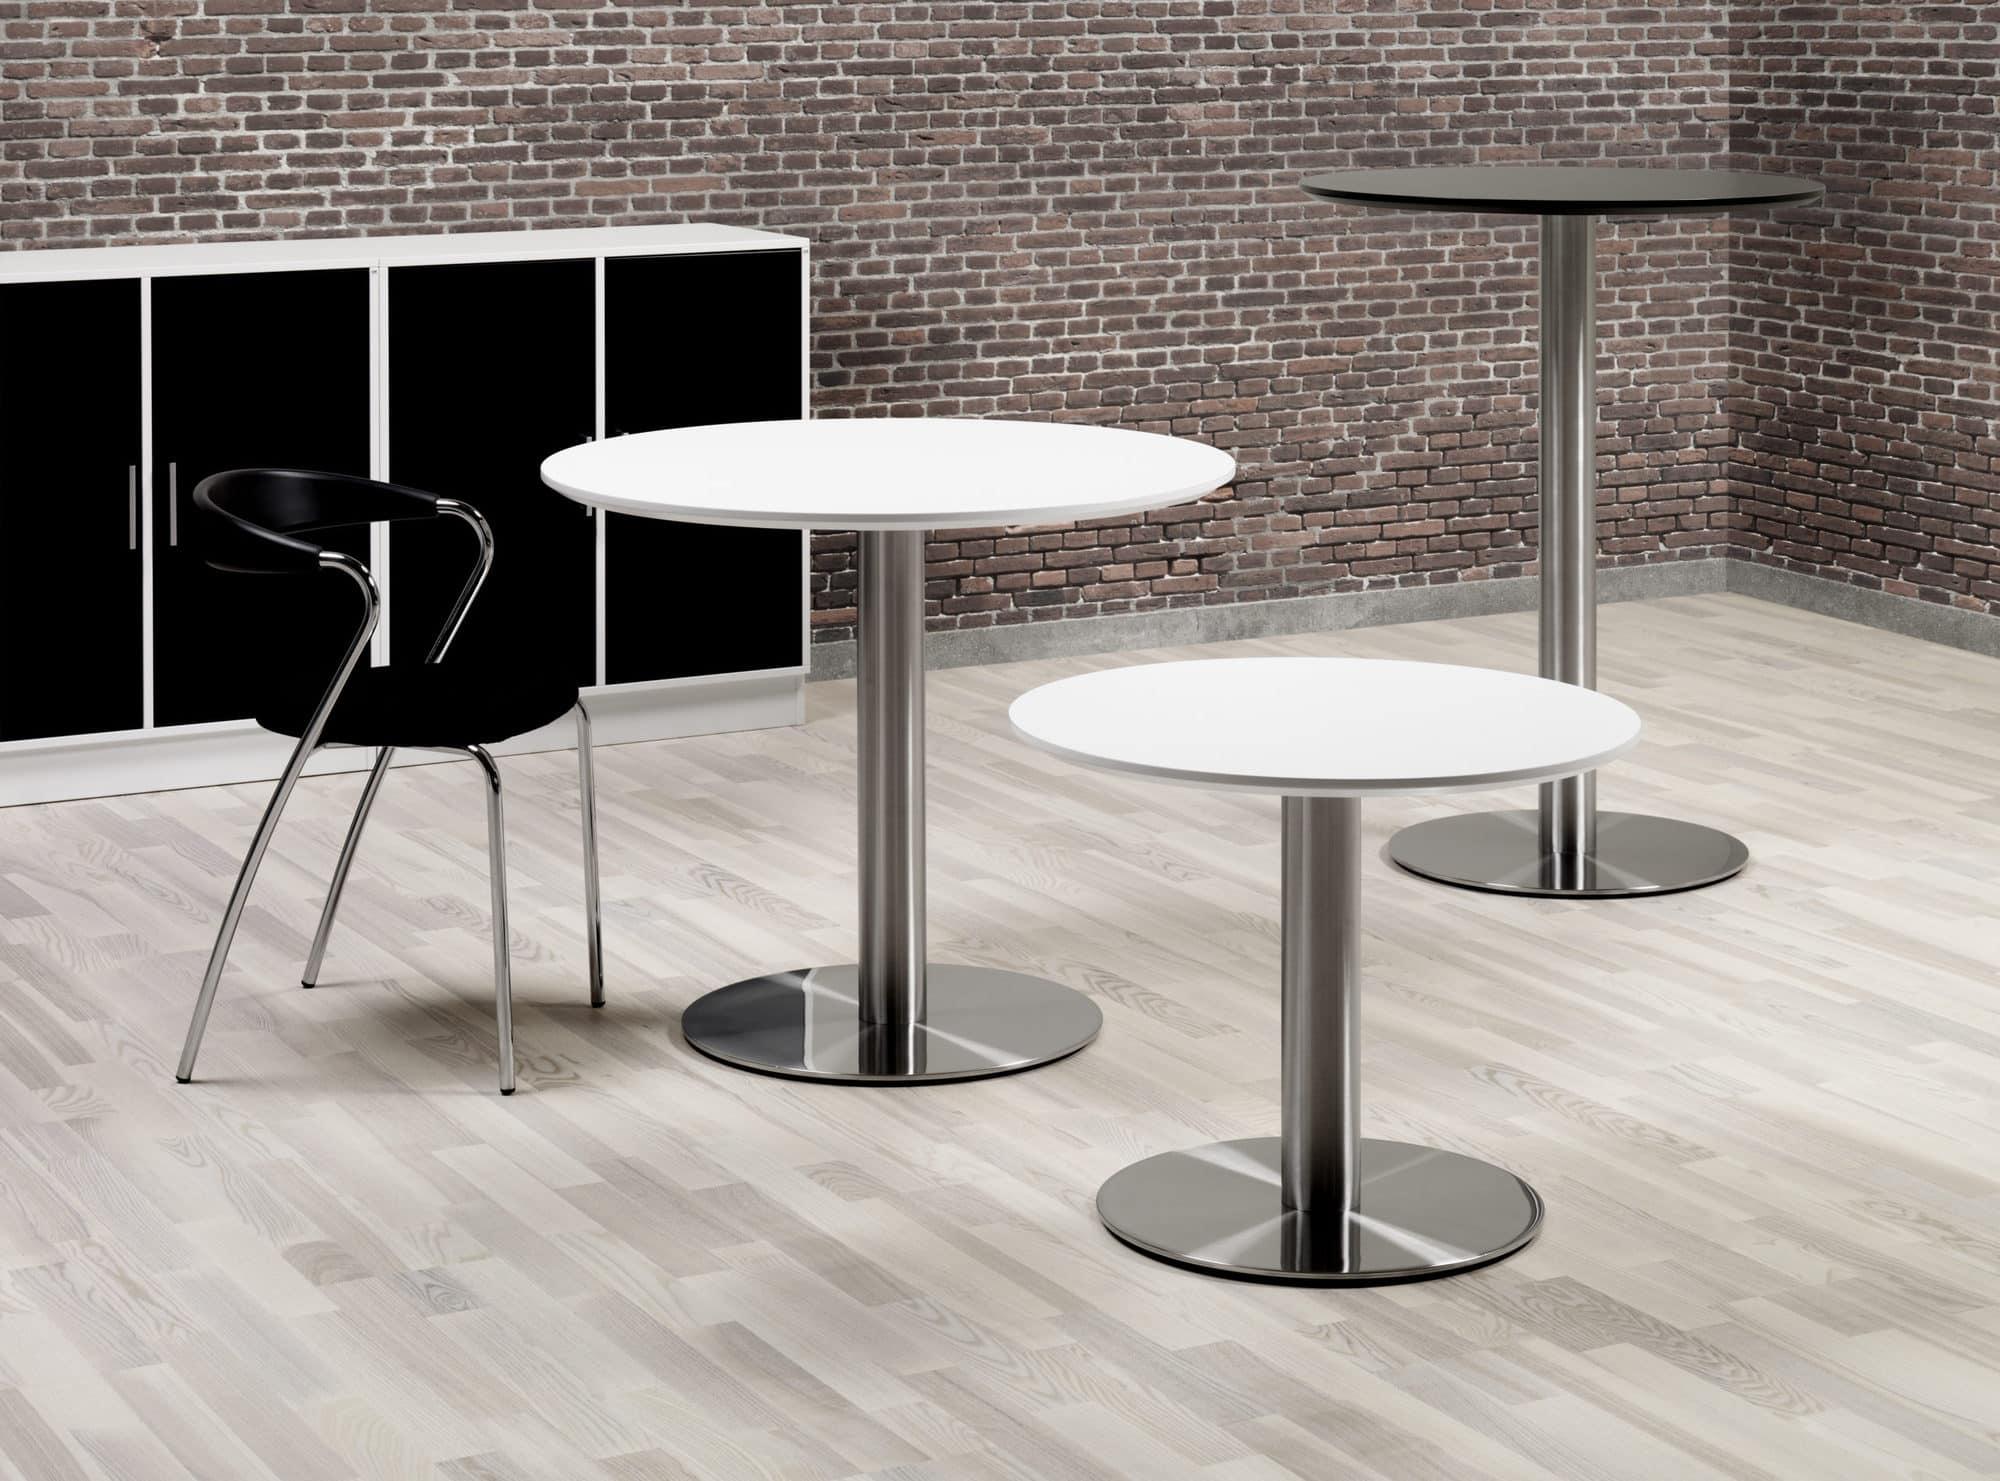 Cube Design - kontormøbler - cafébord